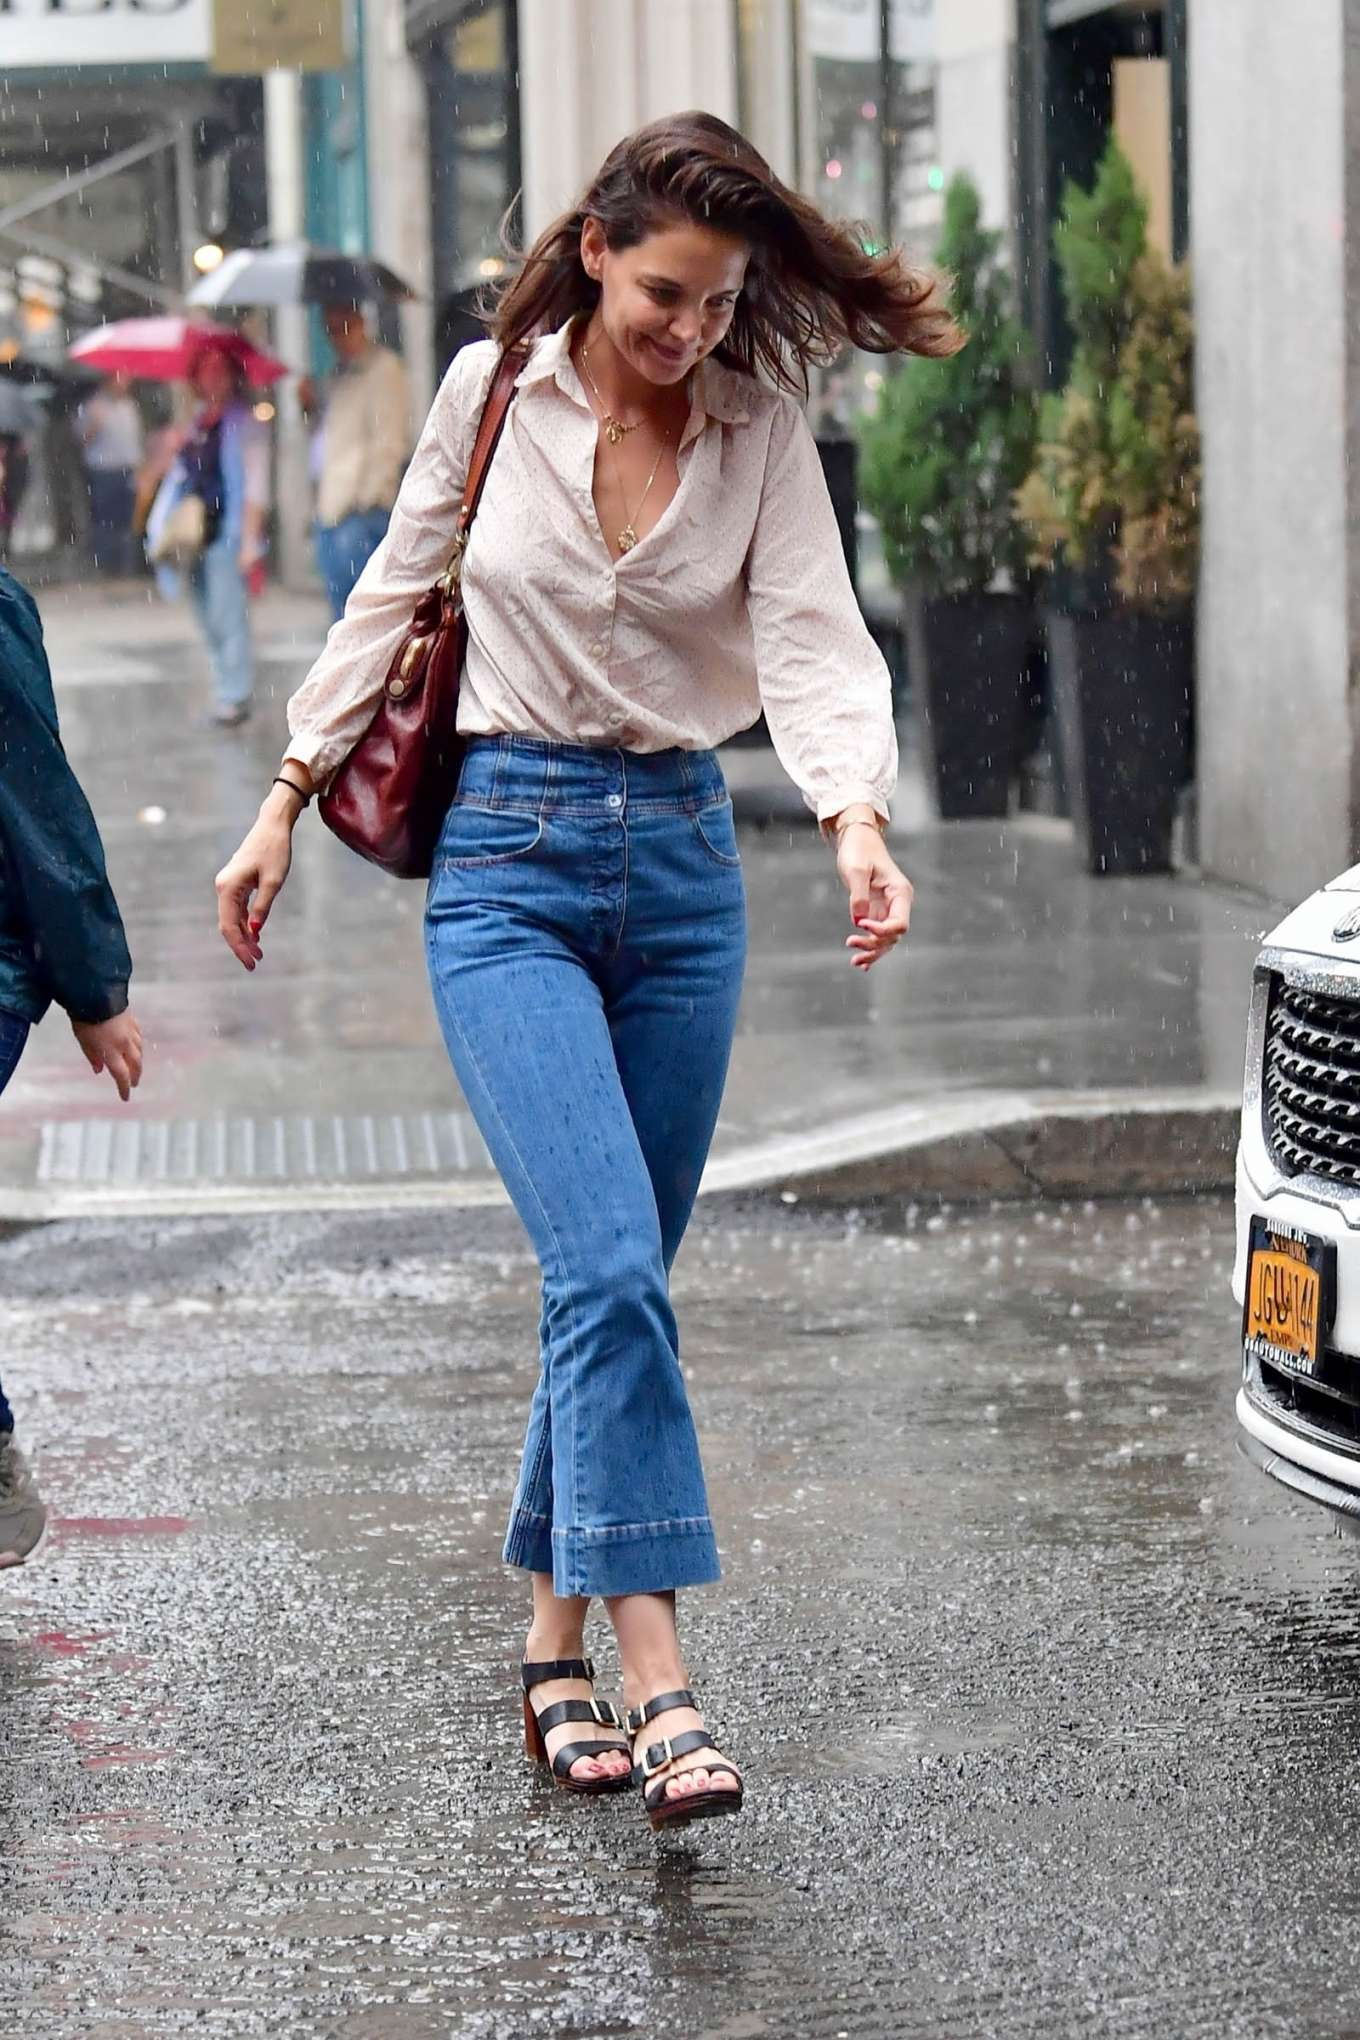 Katie Holmes - Walk in the rain in New York City